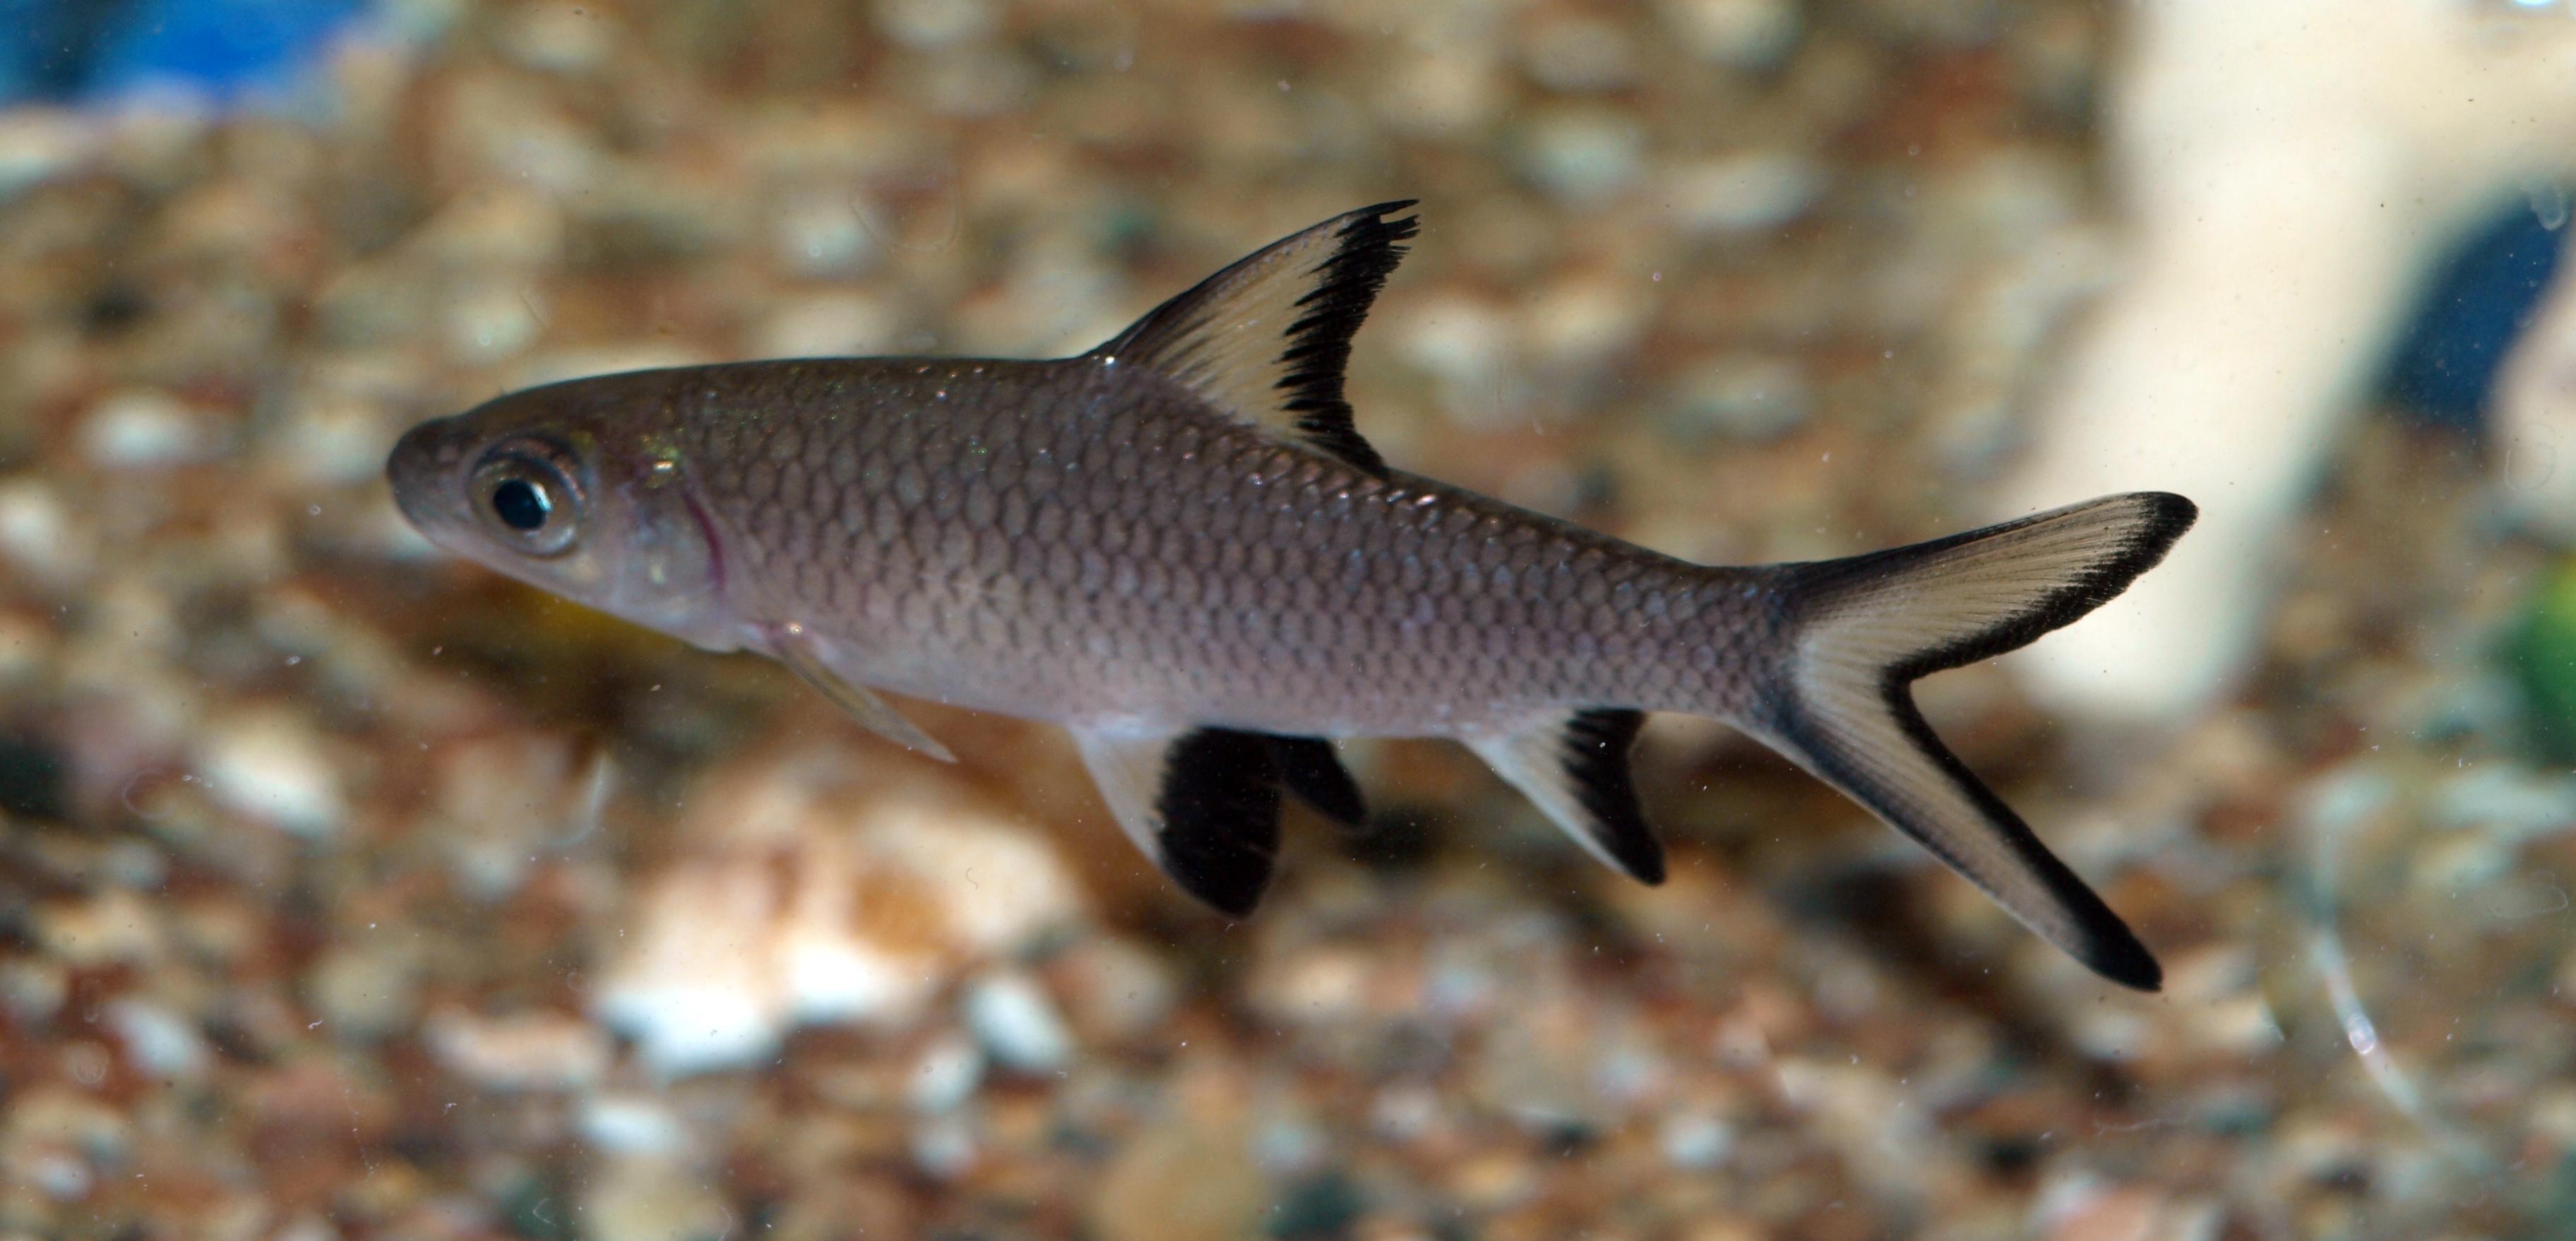 Tiger Oscar South American Cichlid as well Live Fish besides 29 Gallon 4 in addition 75 Gallon Aquarium For Sale Uniquarium 75 Gallon Tube Aquarium Fish Tank Aquariums At Hayneedle besides File Bala Shark. on oscar fish at petsmart